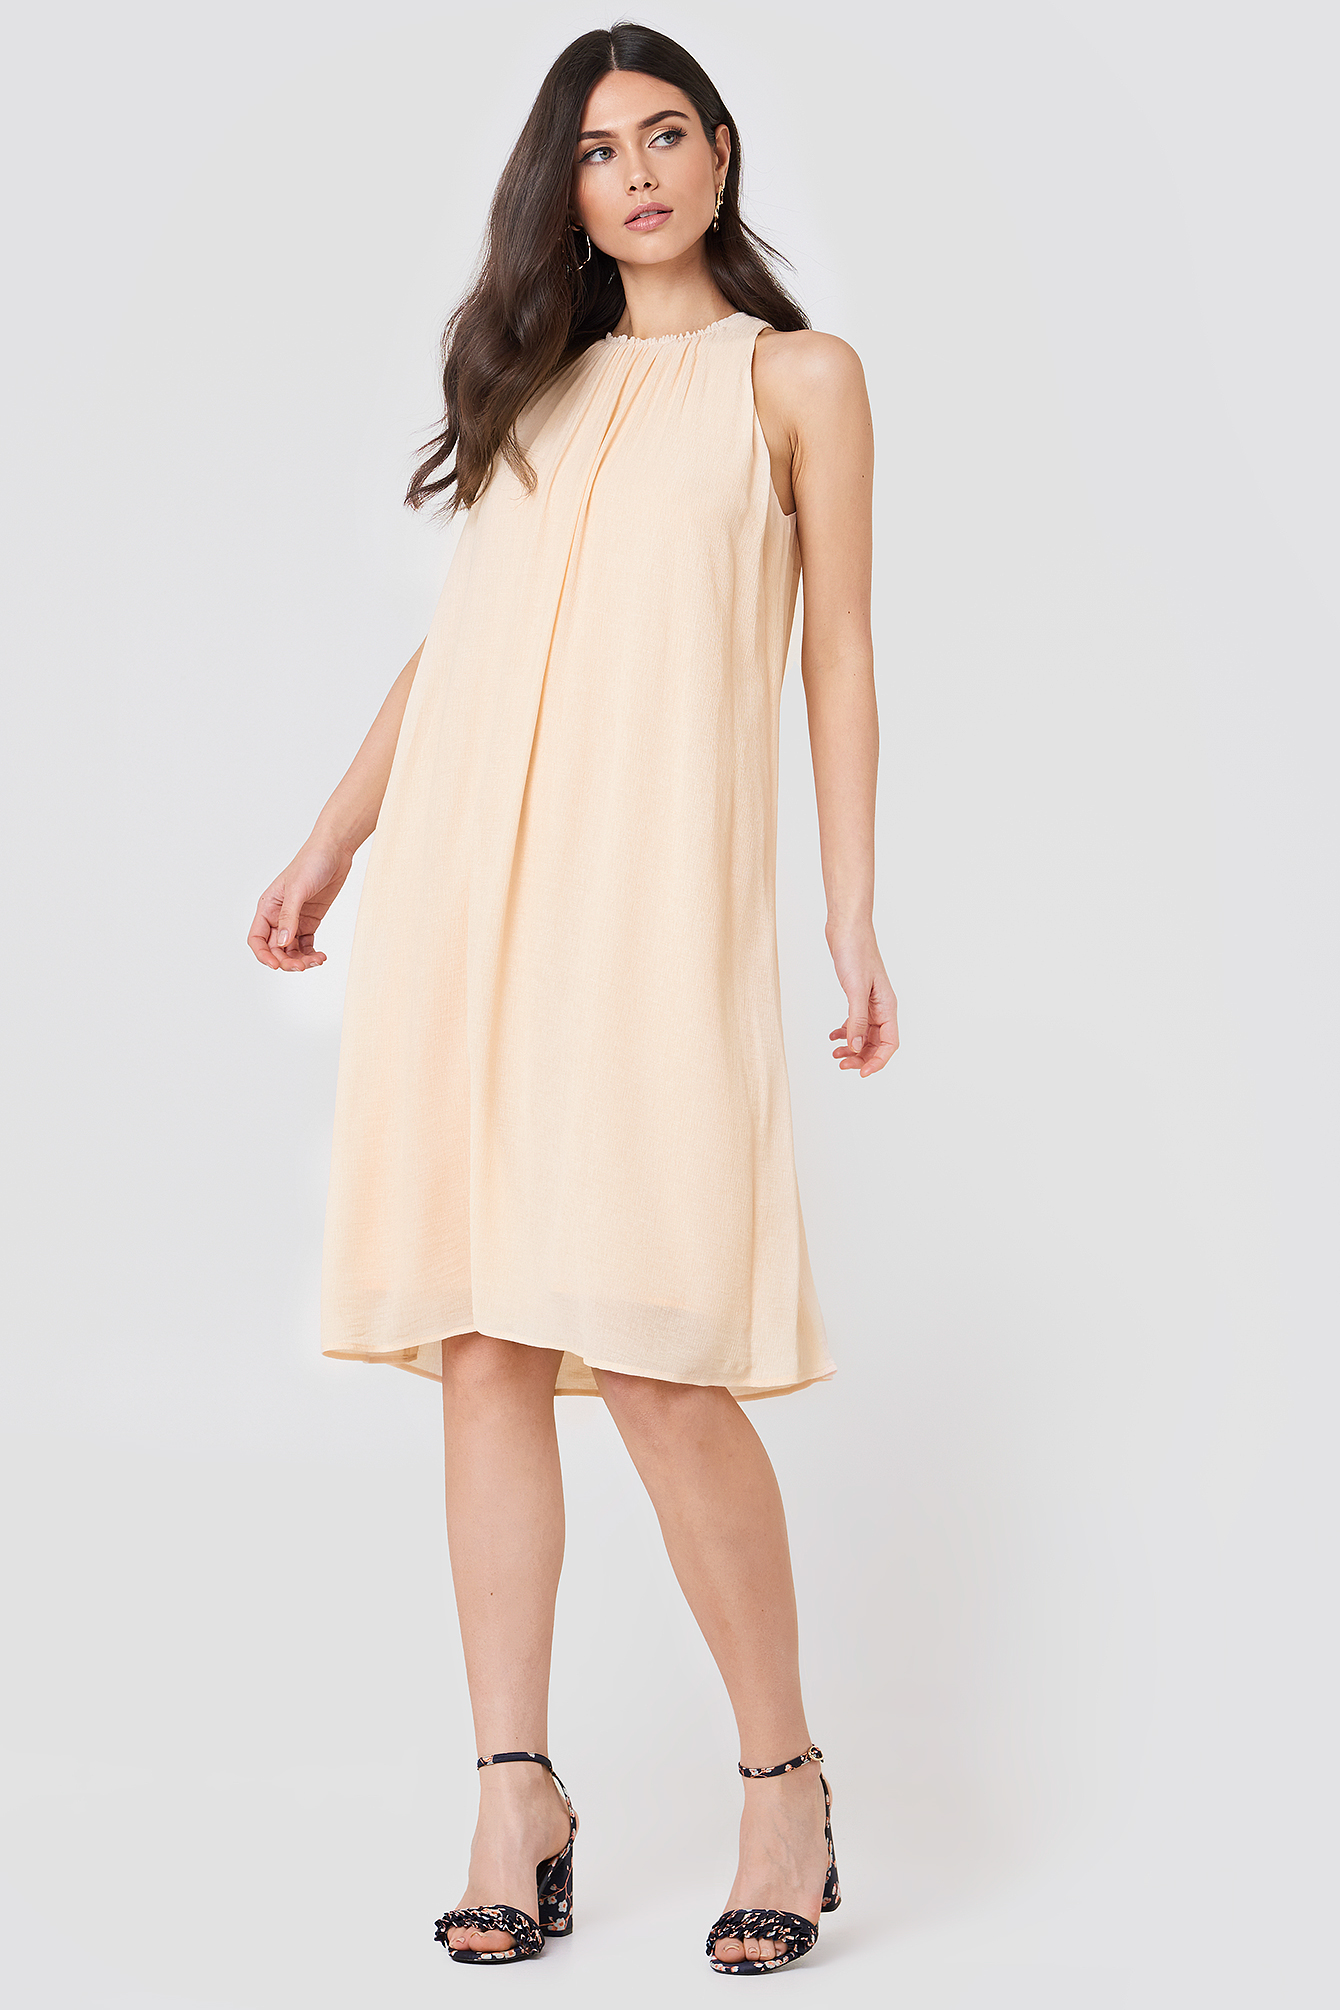 FILIPPA K FLOWY CRINKLE DRESS - ORANGE